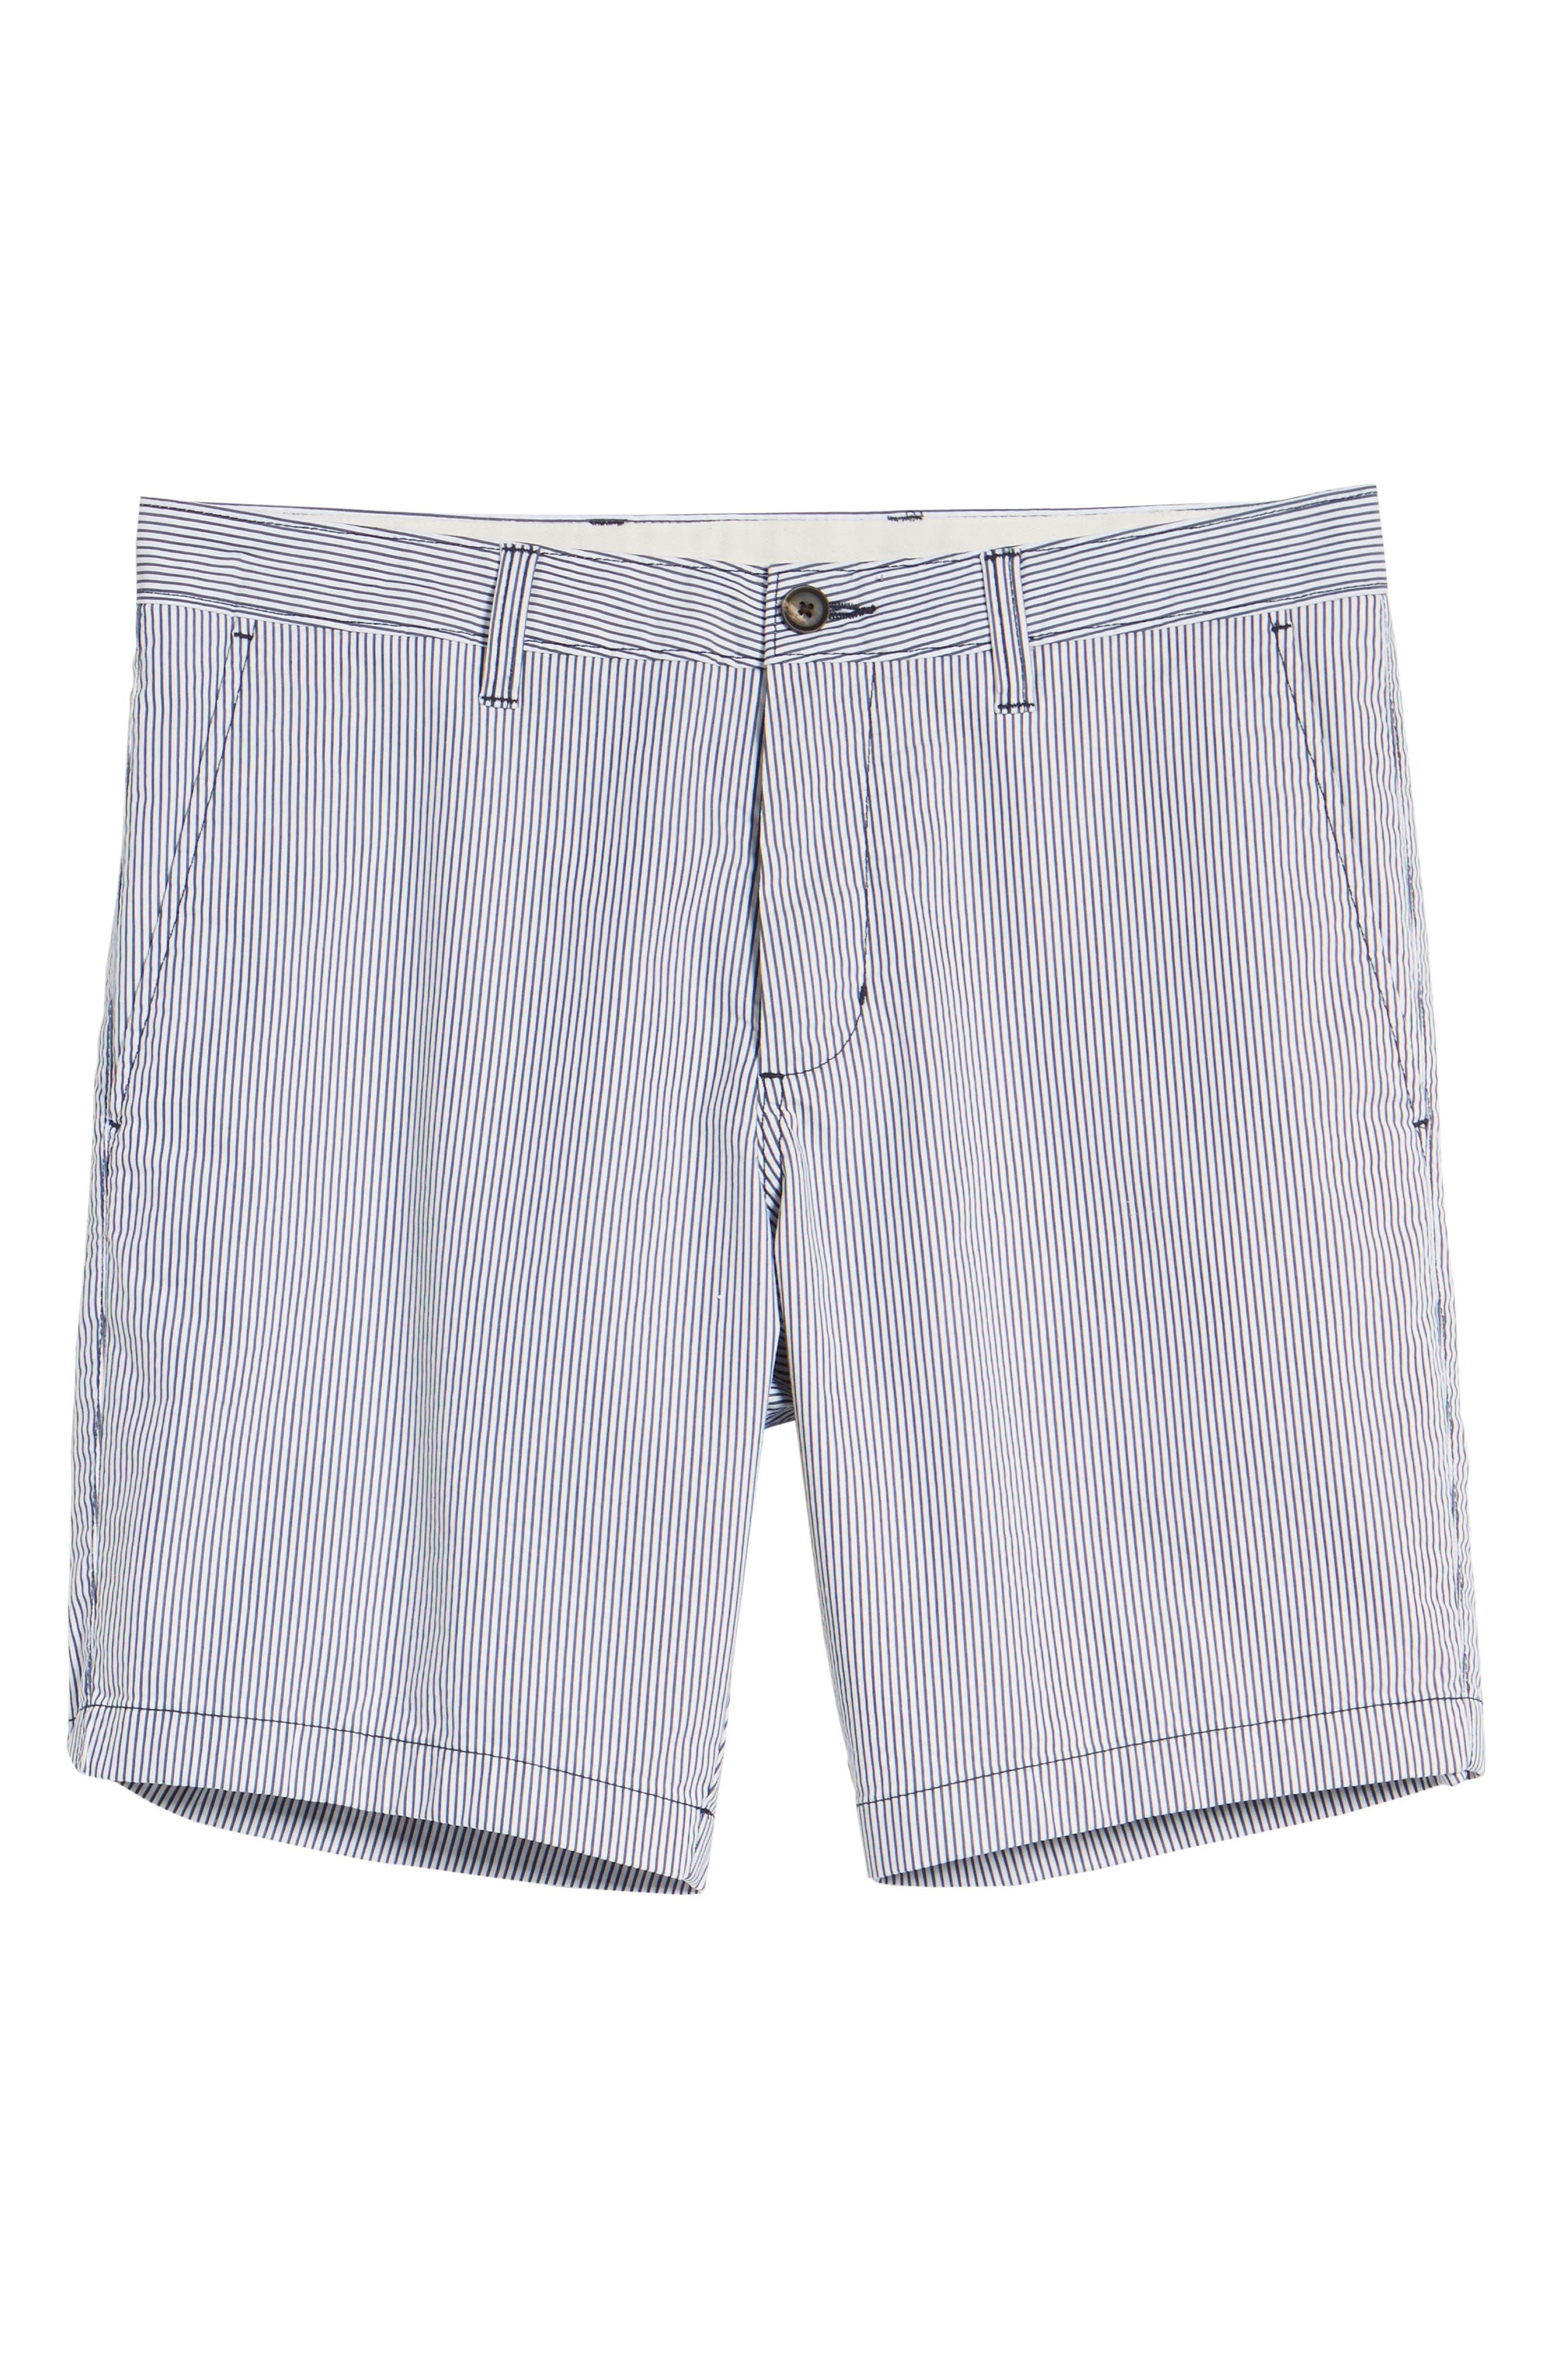 Ballard Slim Fit Seersucker Shorts,                             Alternate thumbnail 6, color,                             410